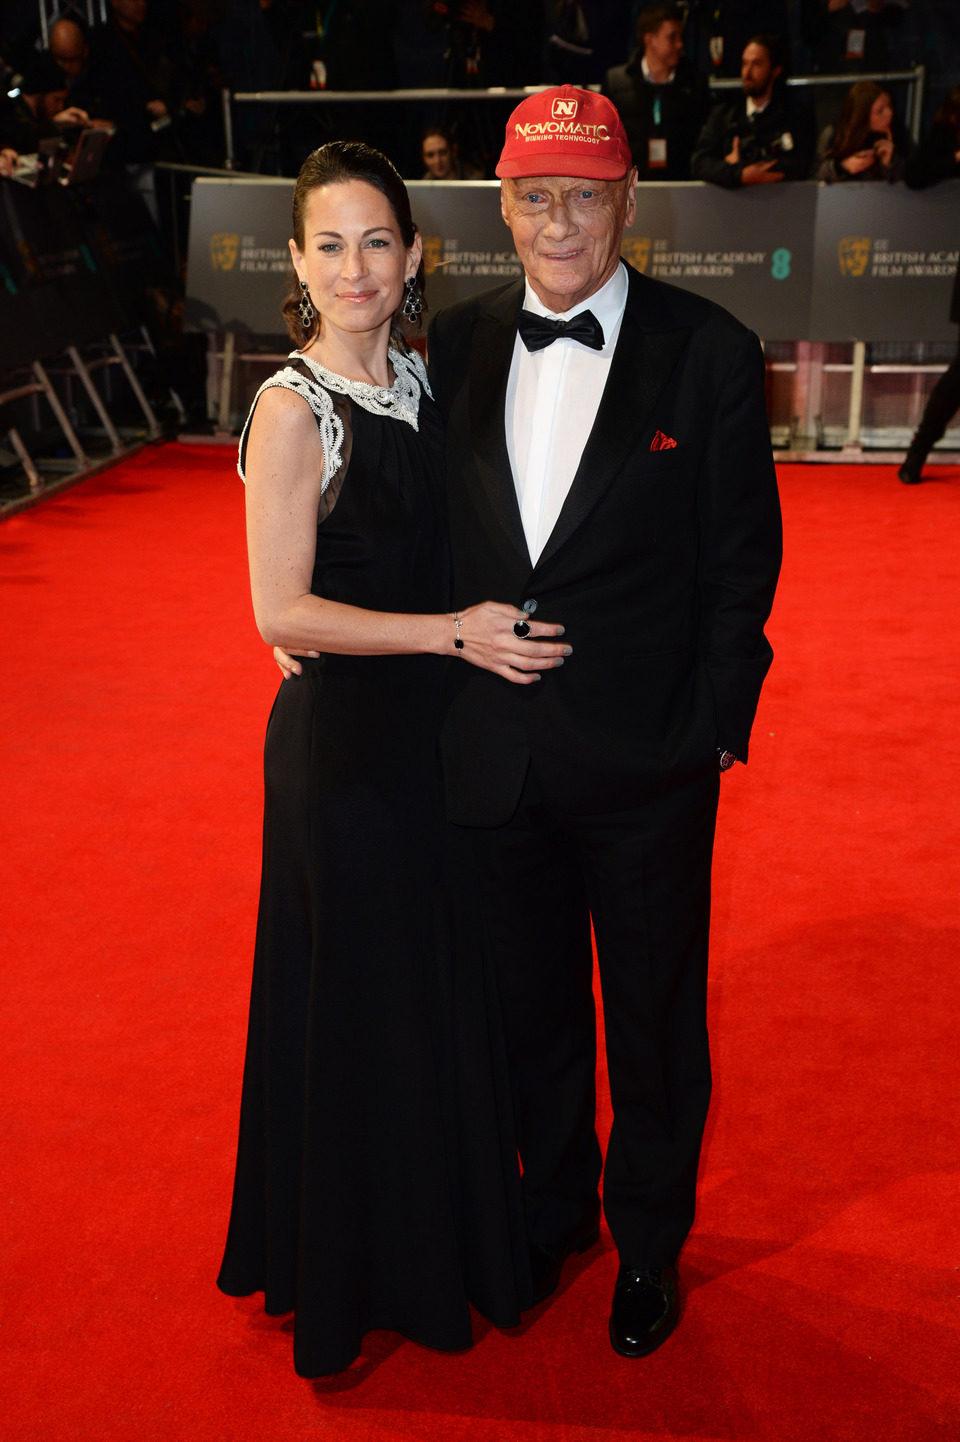 Niki Lauda en los Premios BAFTA 2014